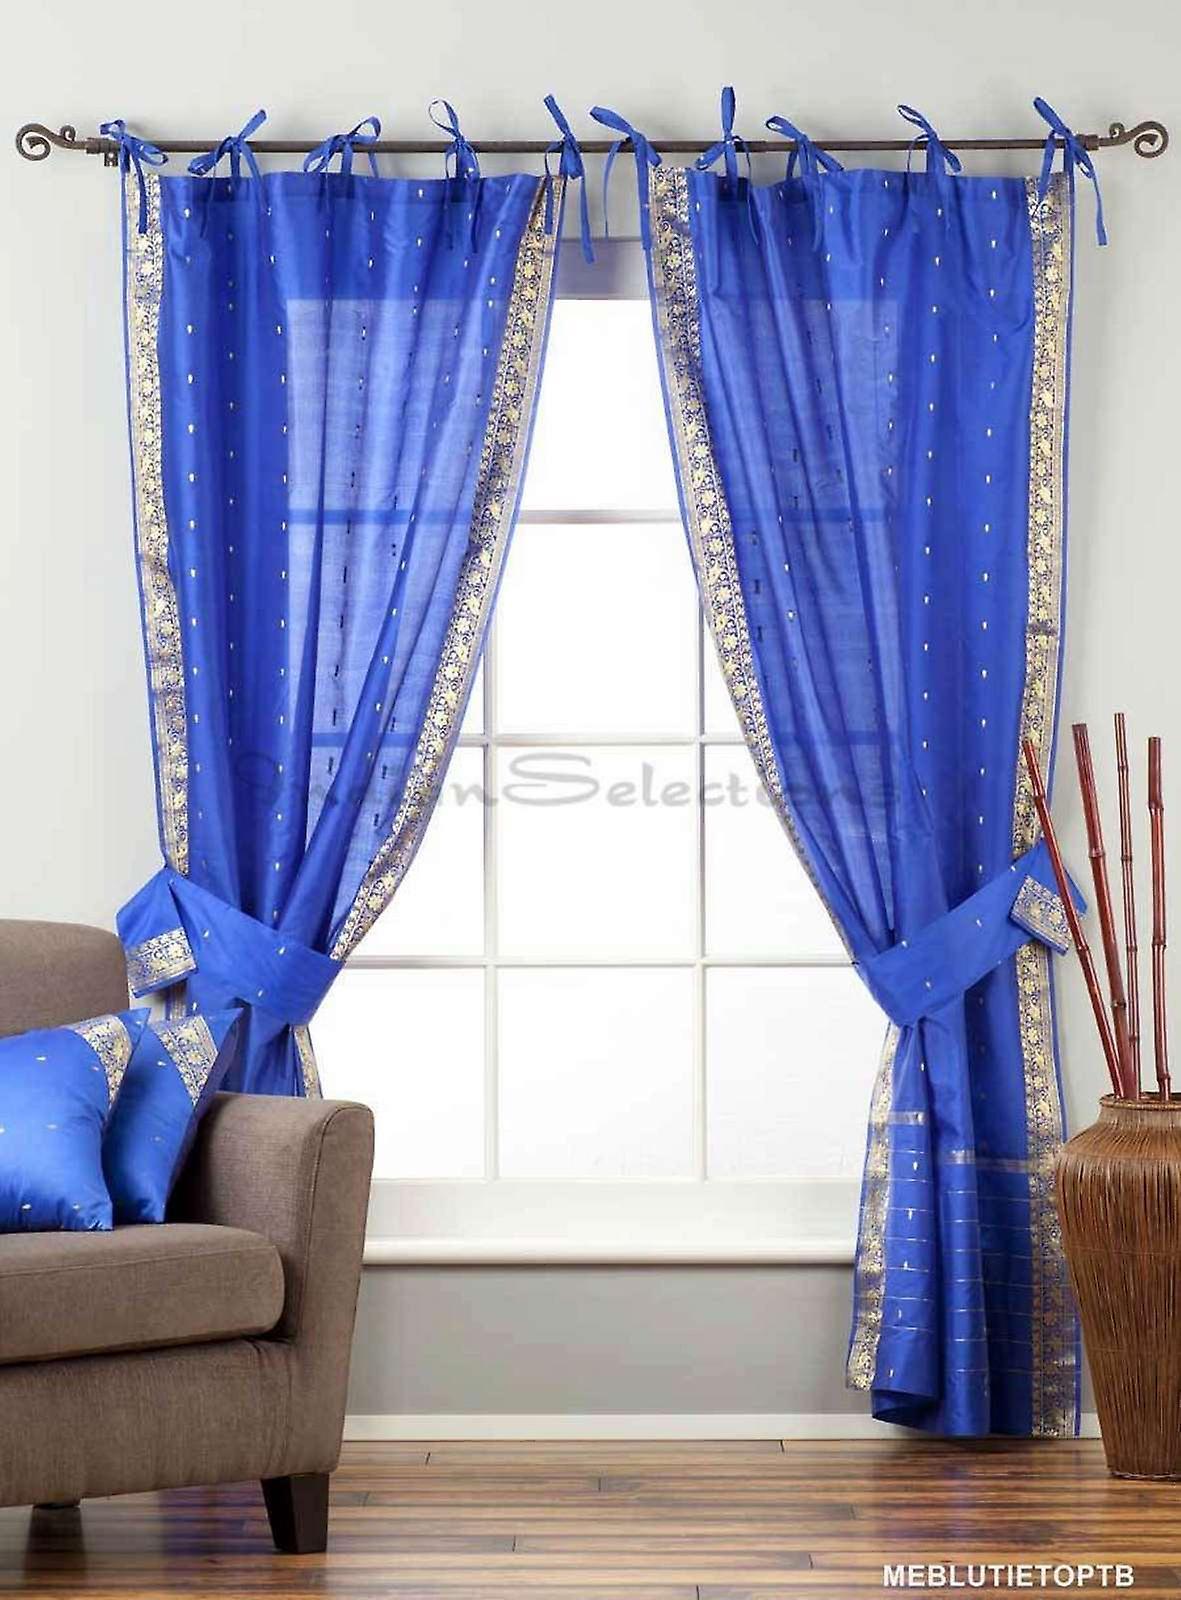 WMatching Top Sari Blue In 43x84 Tieback Tie Indo Curtain Sheer Drape Panel HDW92IYE